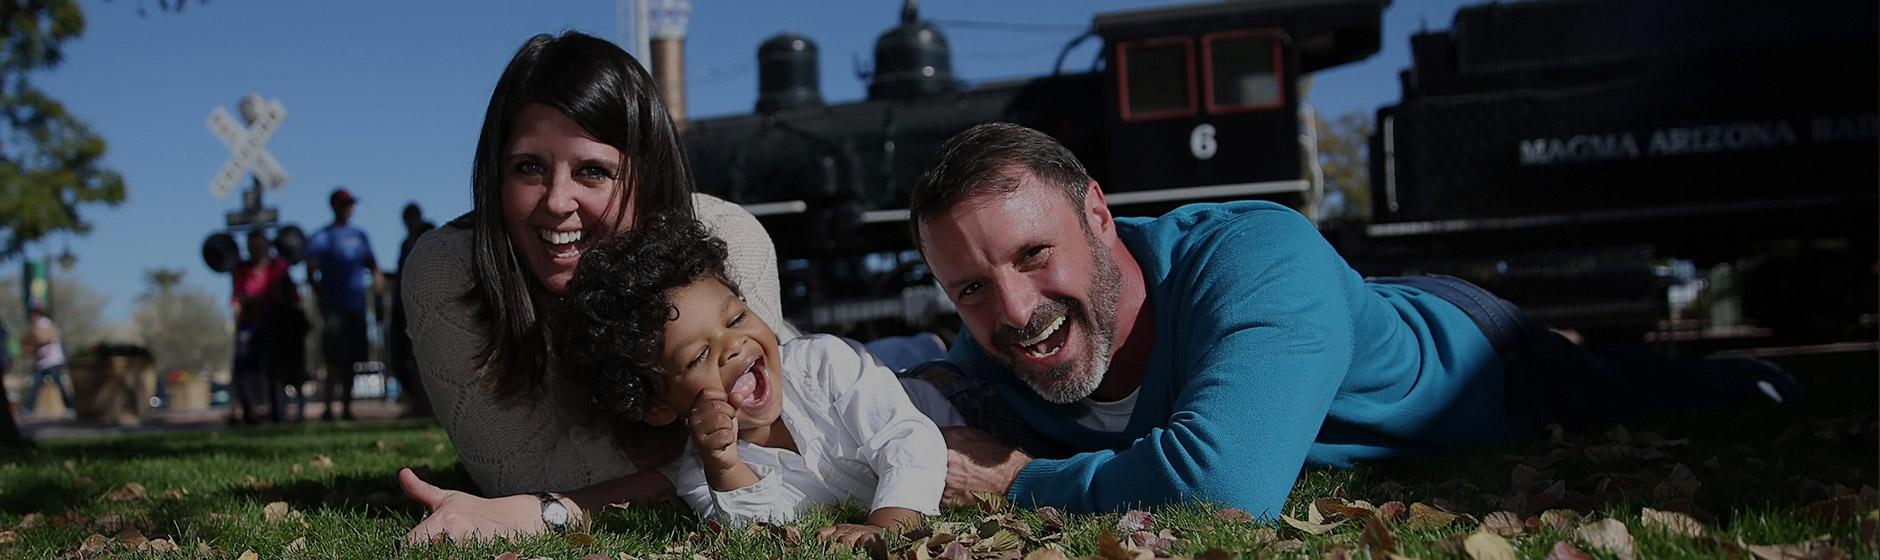 McCormick-Stillman Railroad Park has Fun for the Whole Family!